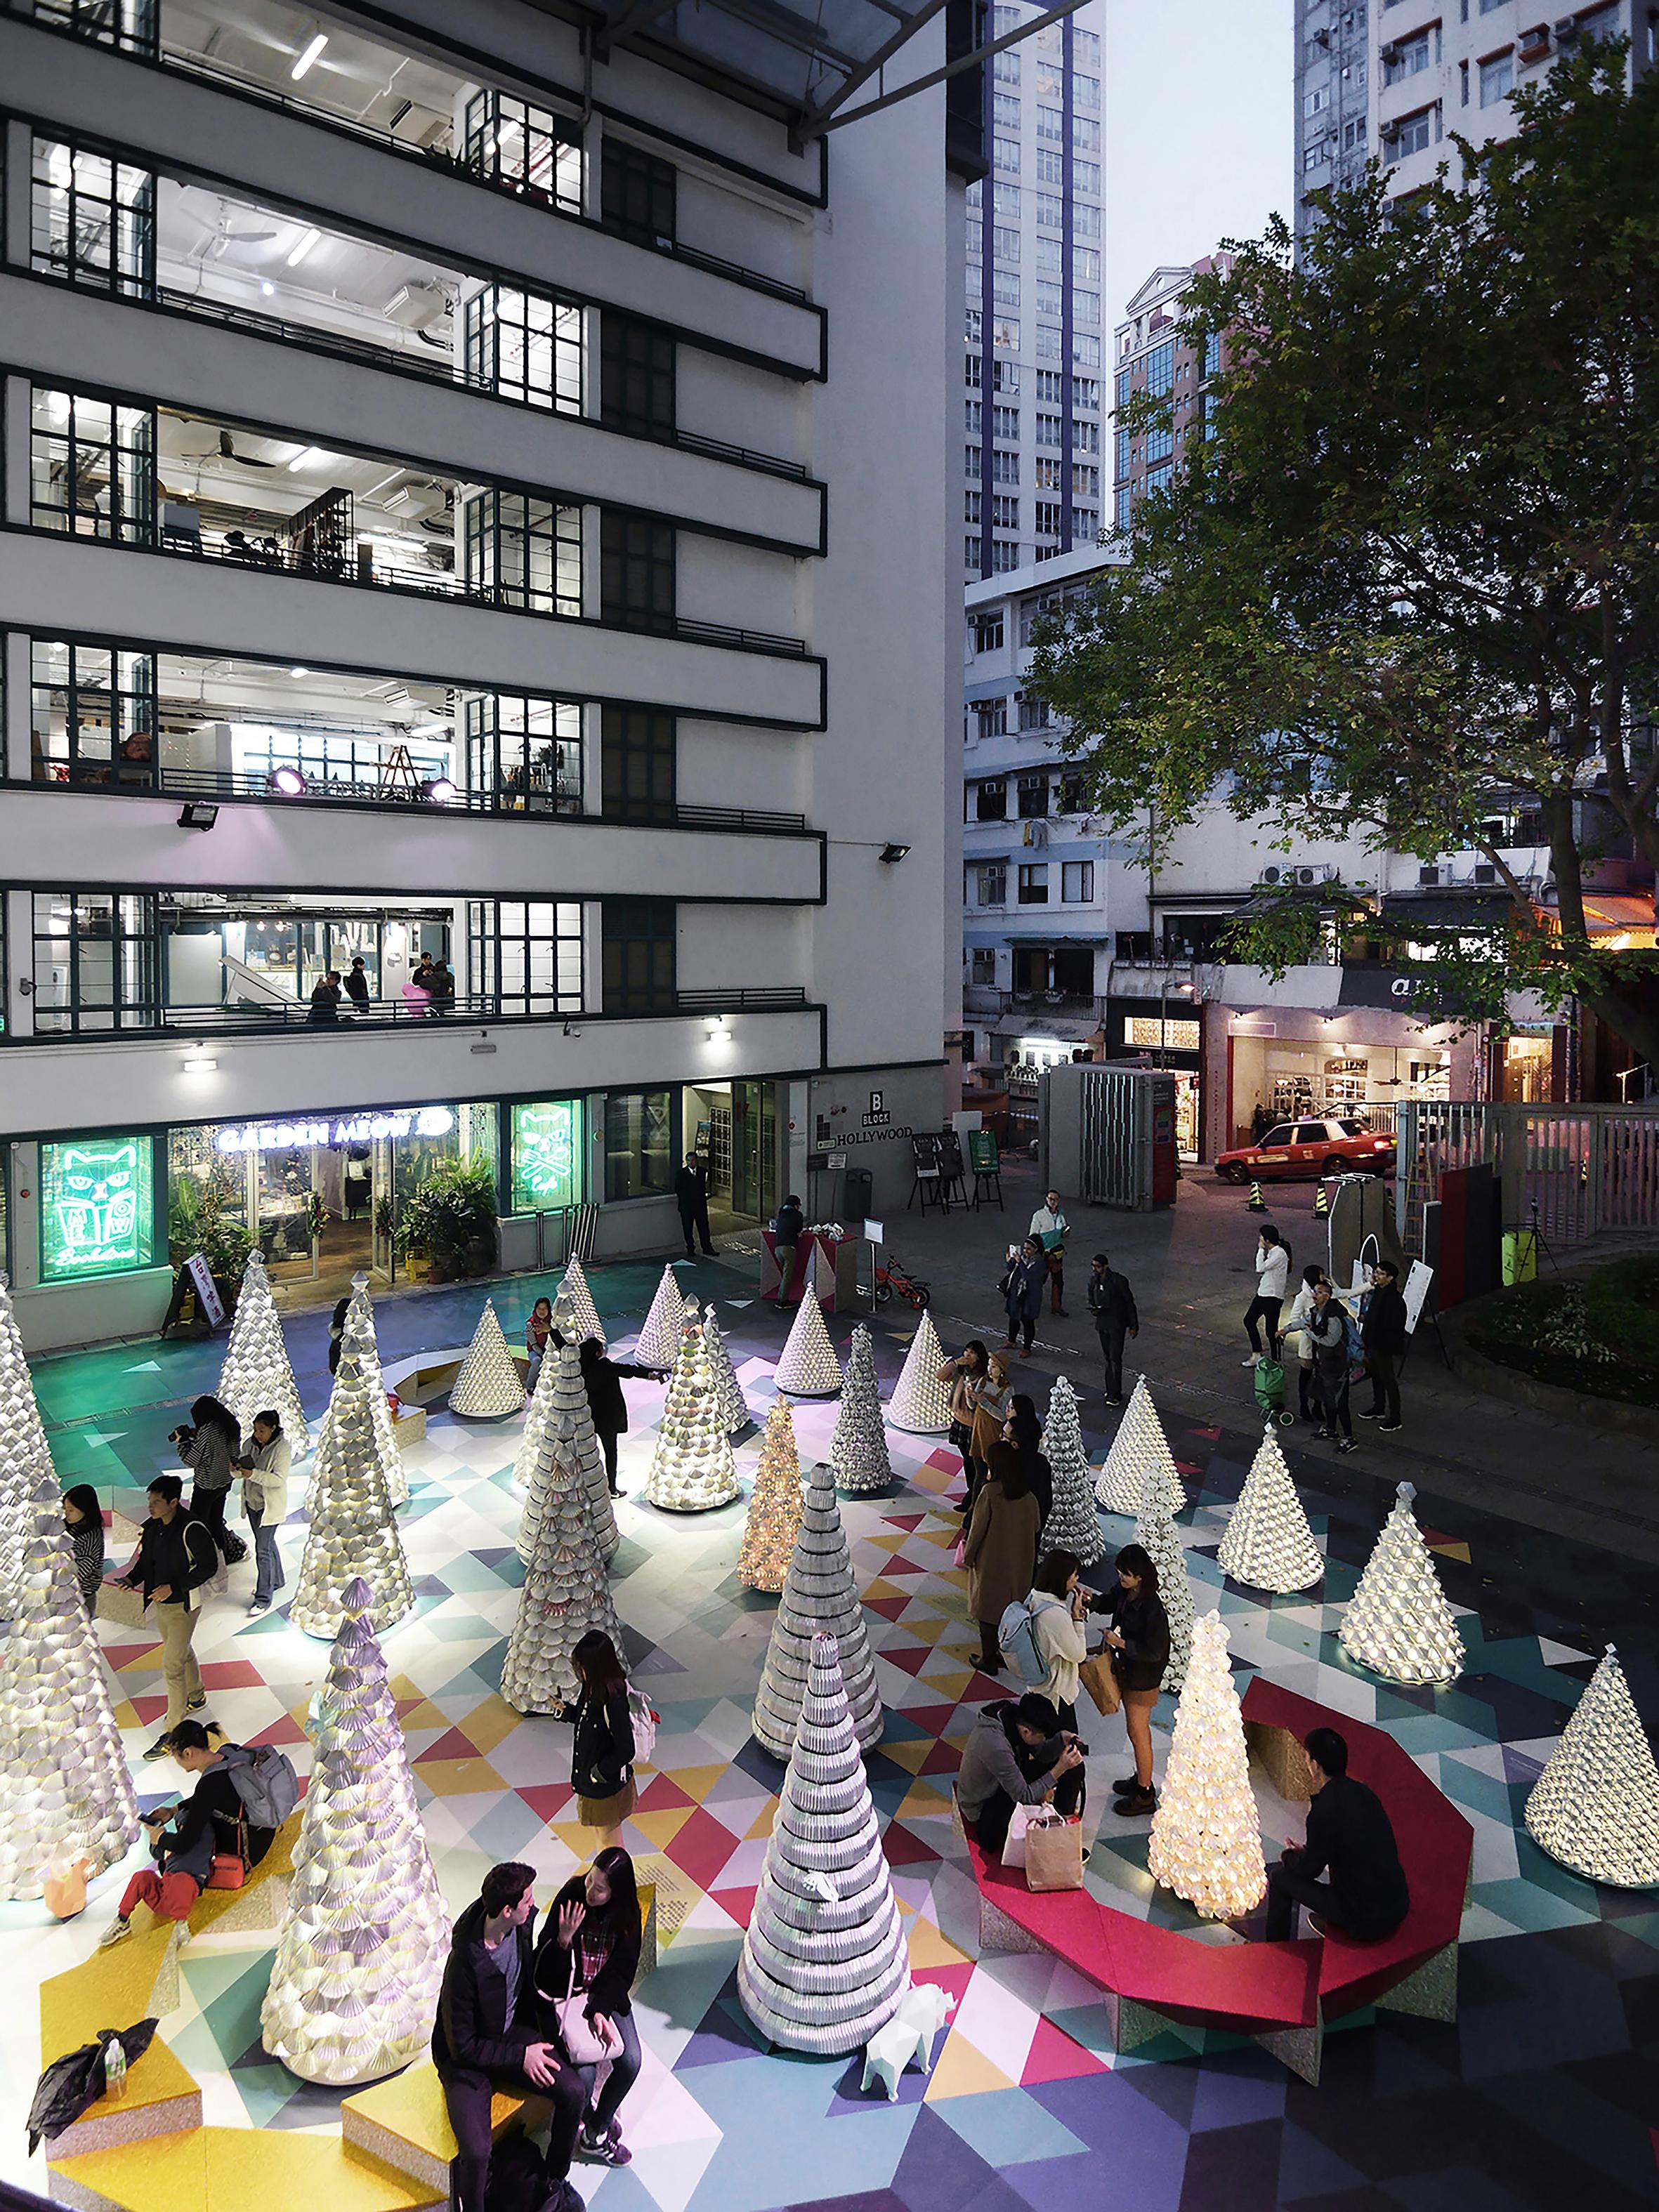 XMAS' TREE NURSERY - Design by: AaaM ARCHITECTSInterior Division: Pop-Up (Urban Design)Website: https://www.facebook.com/aaamarchi